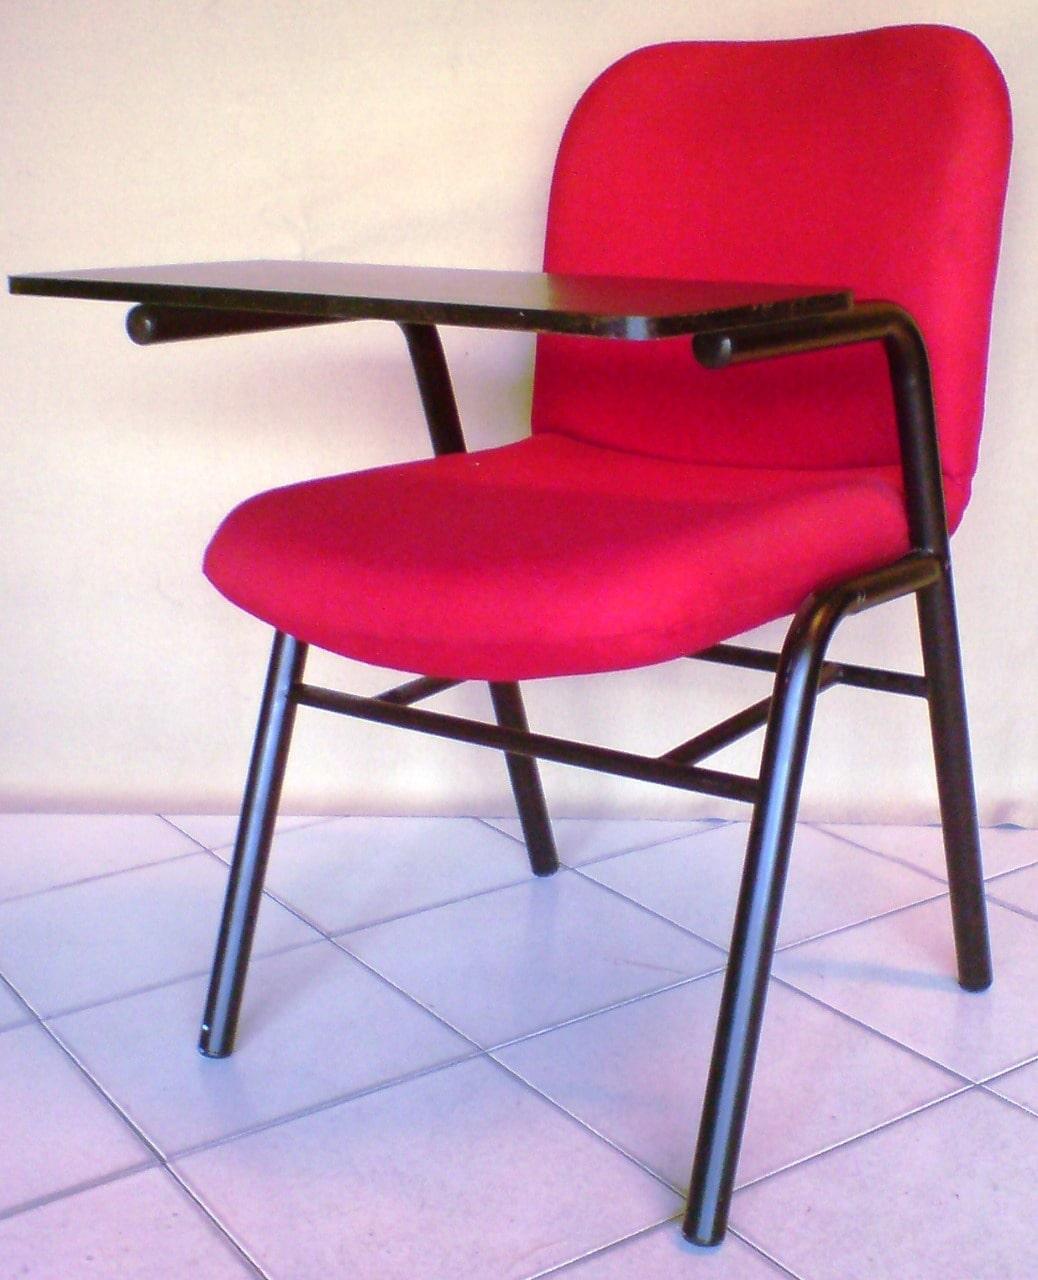 yeti conferance chair-betterhomeindia